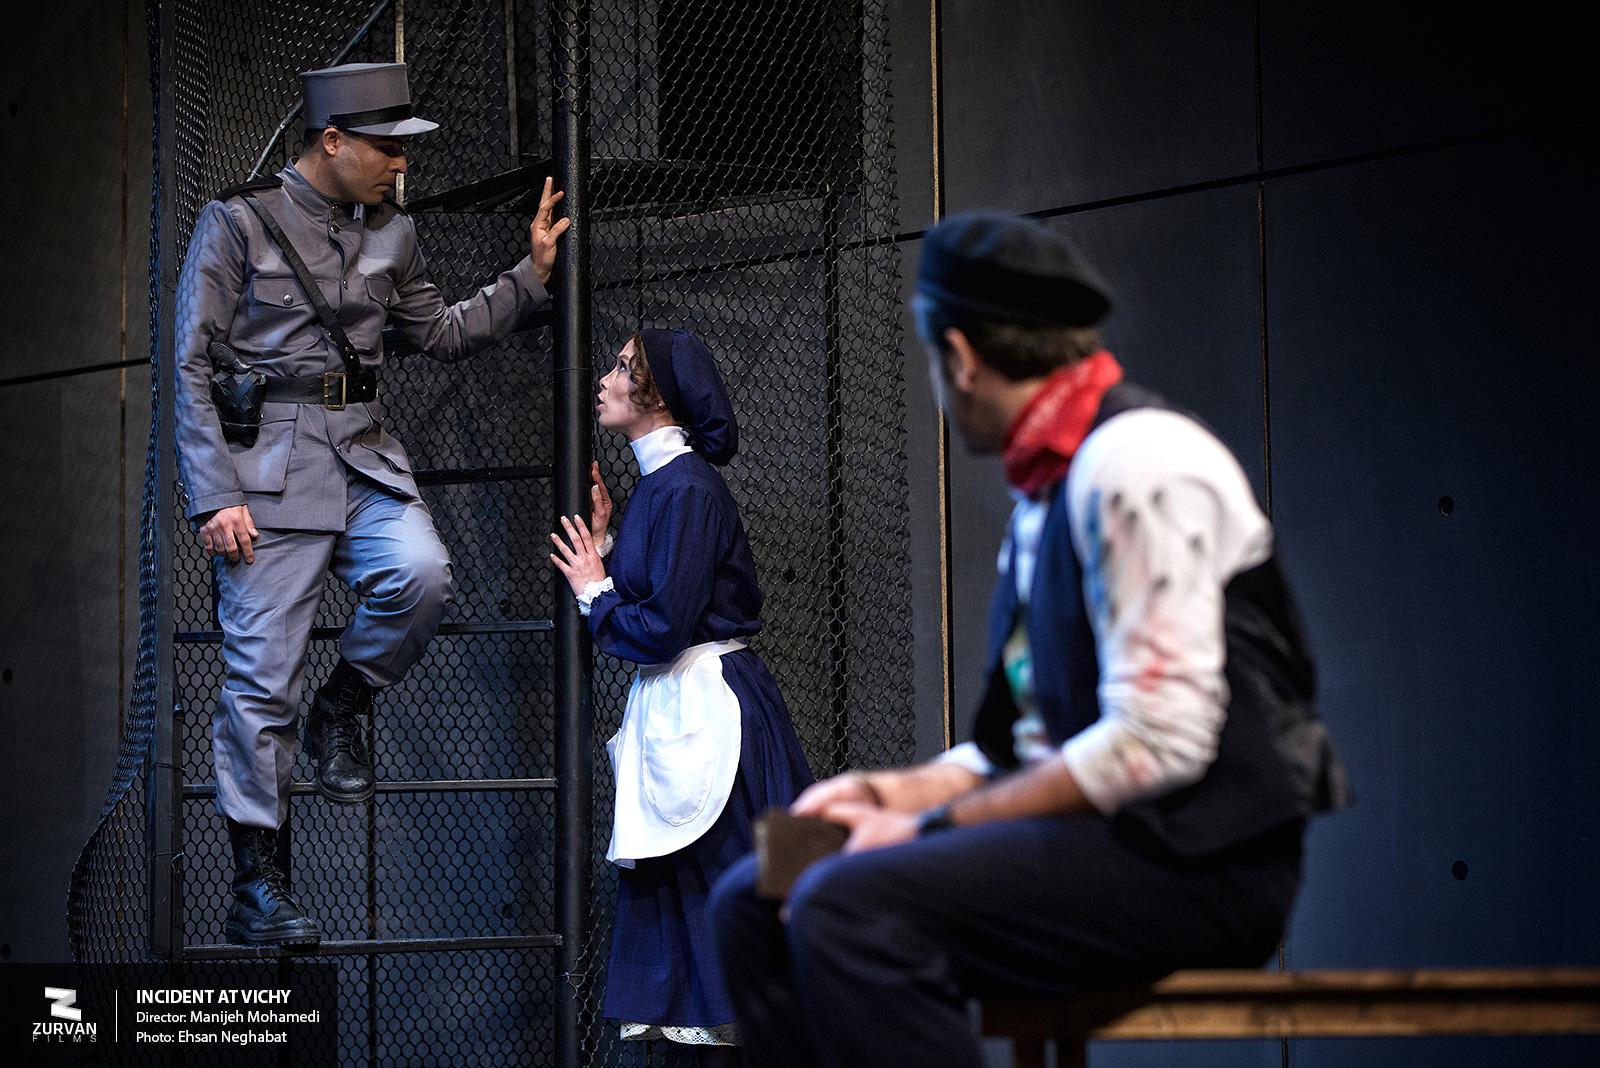 Incident at Vichy [Photo 7]